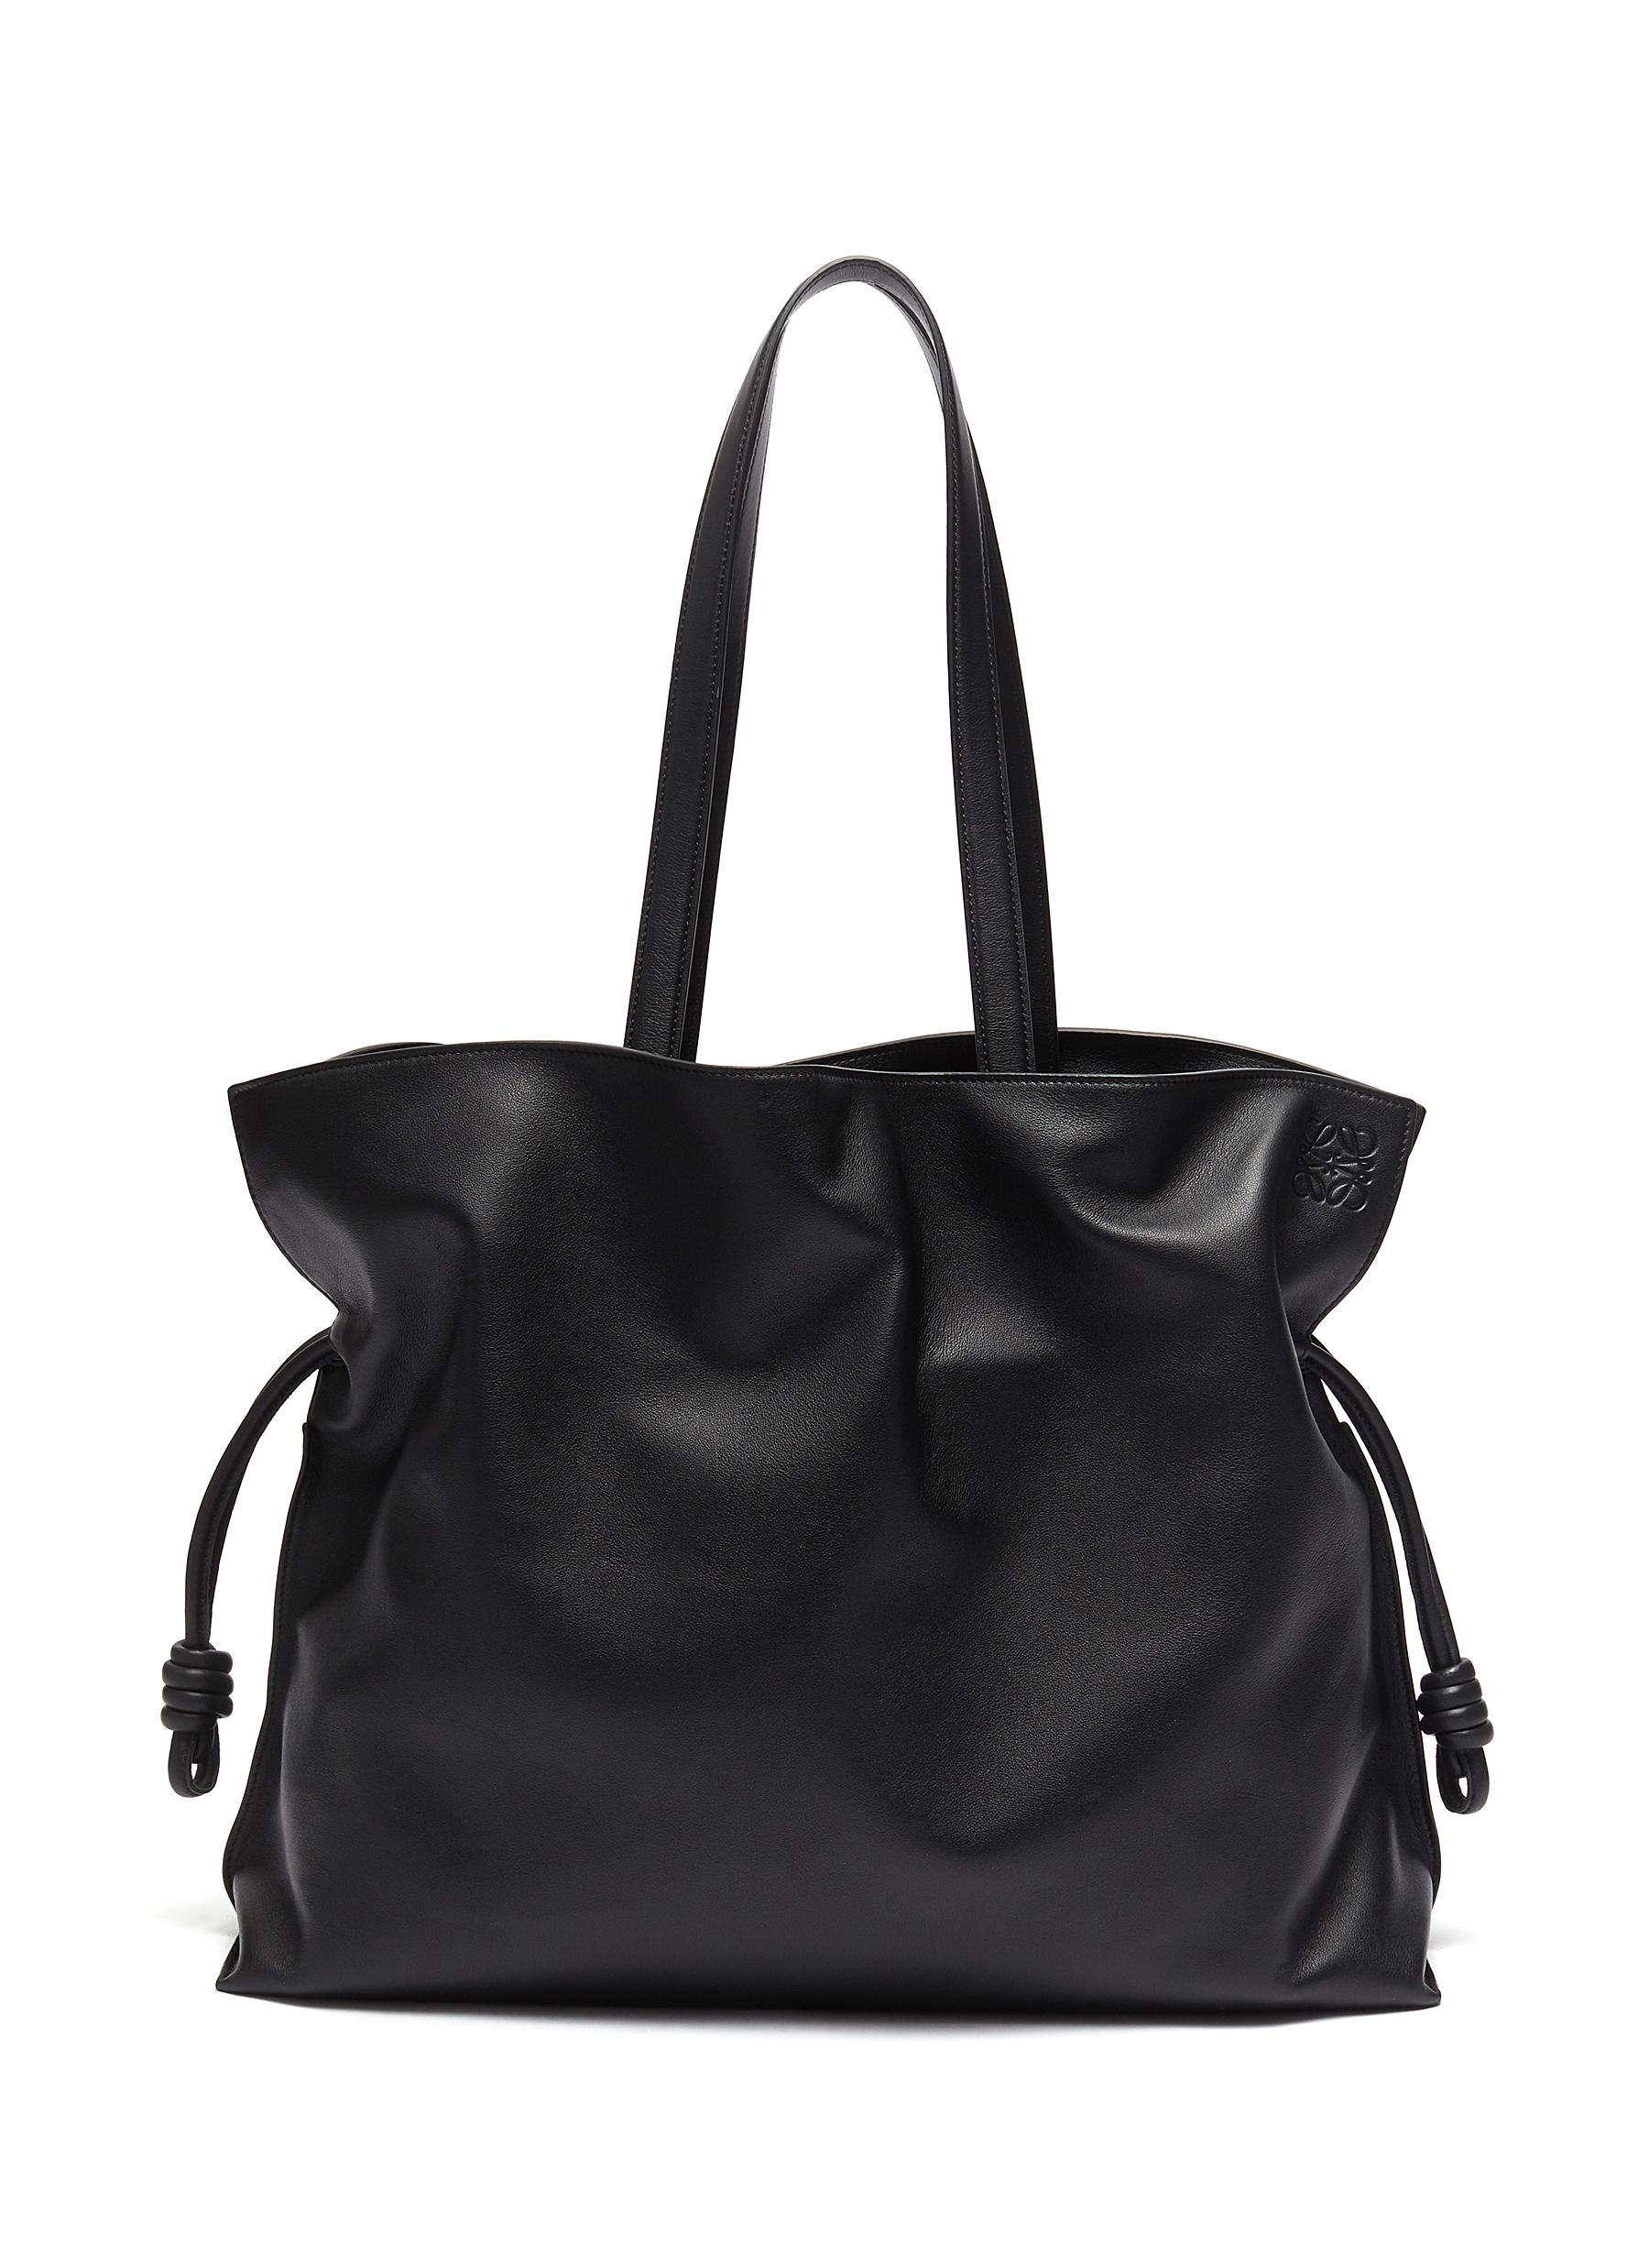 Flamenco XL' top handle leather bag